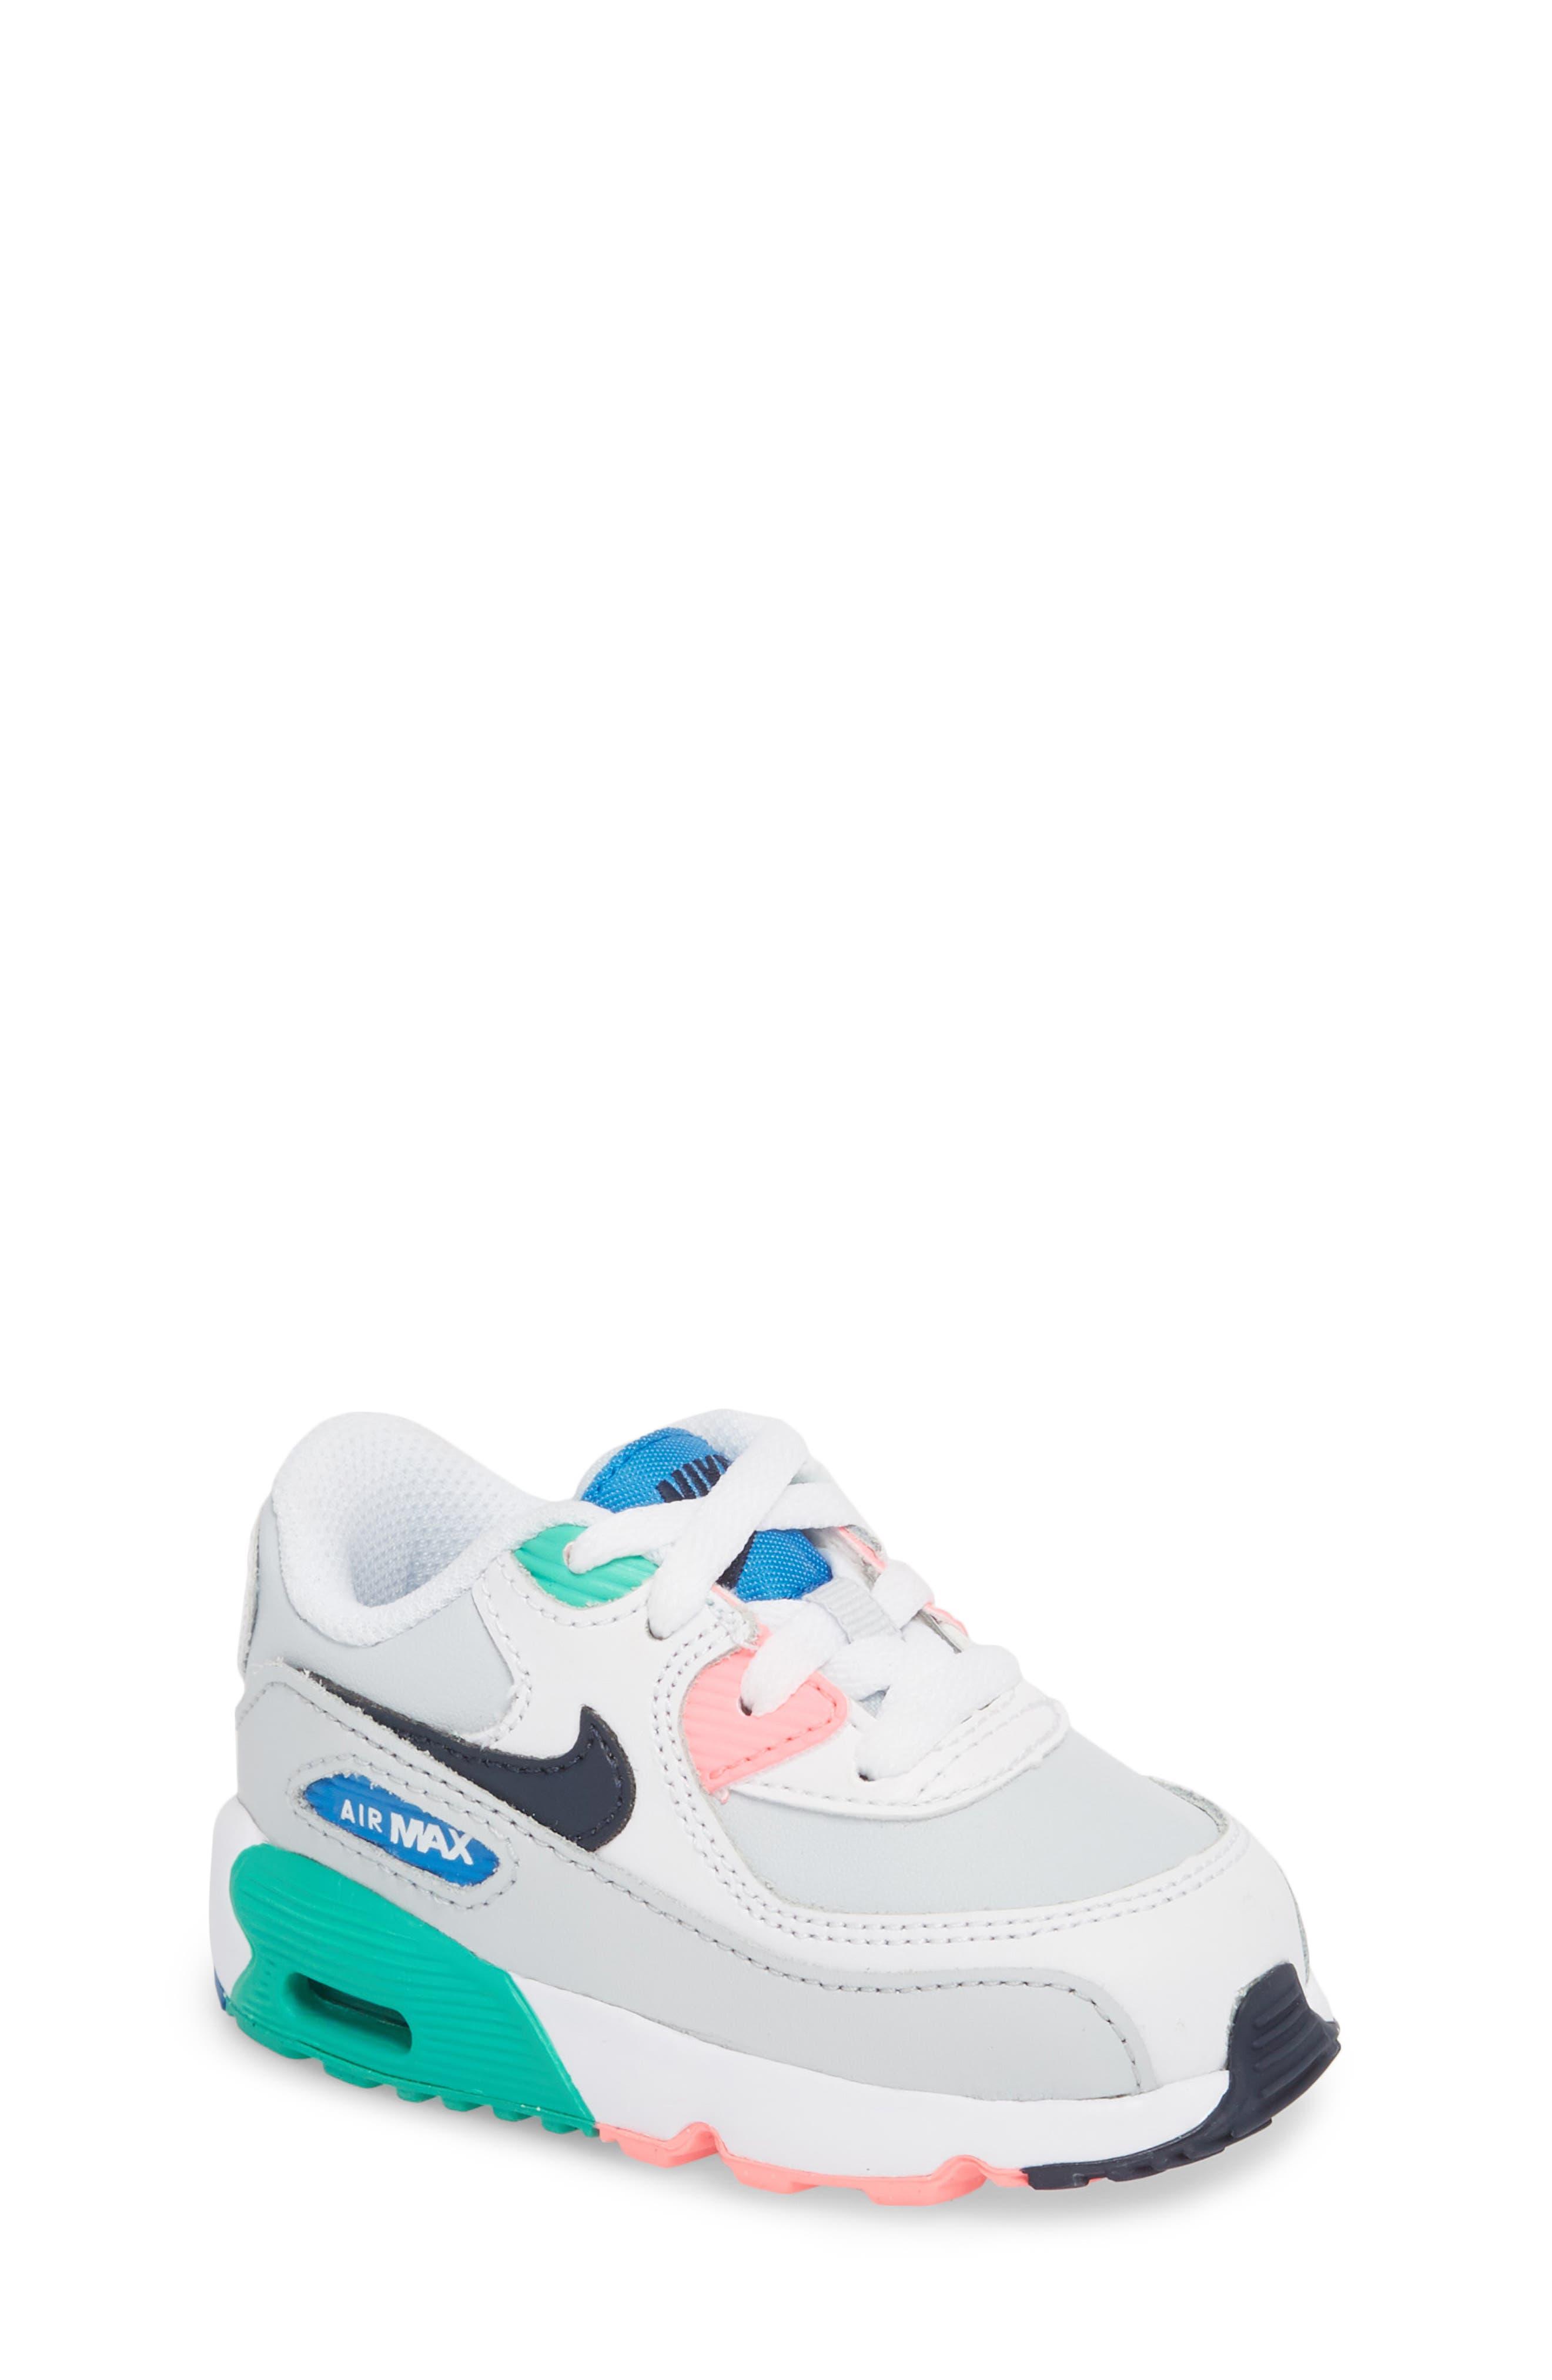 Air Max 90 Sneaker,                             Main thumbnail 1, color,